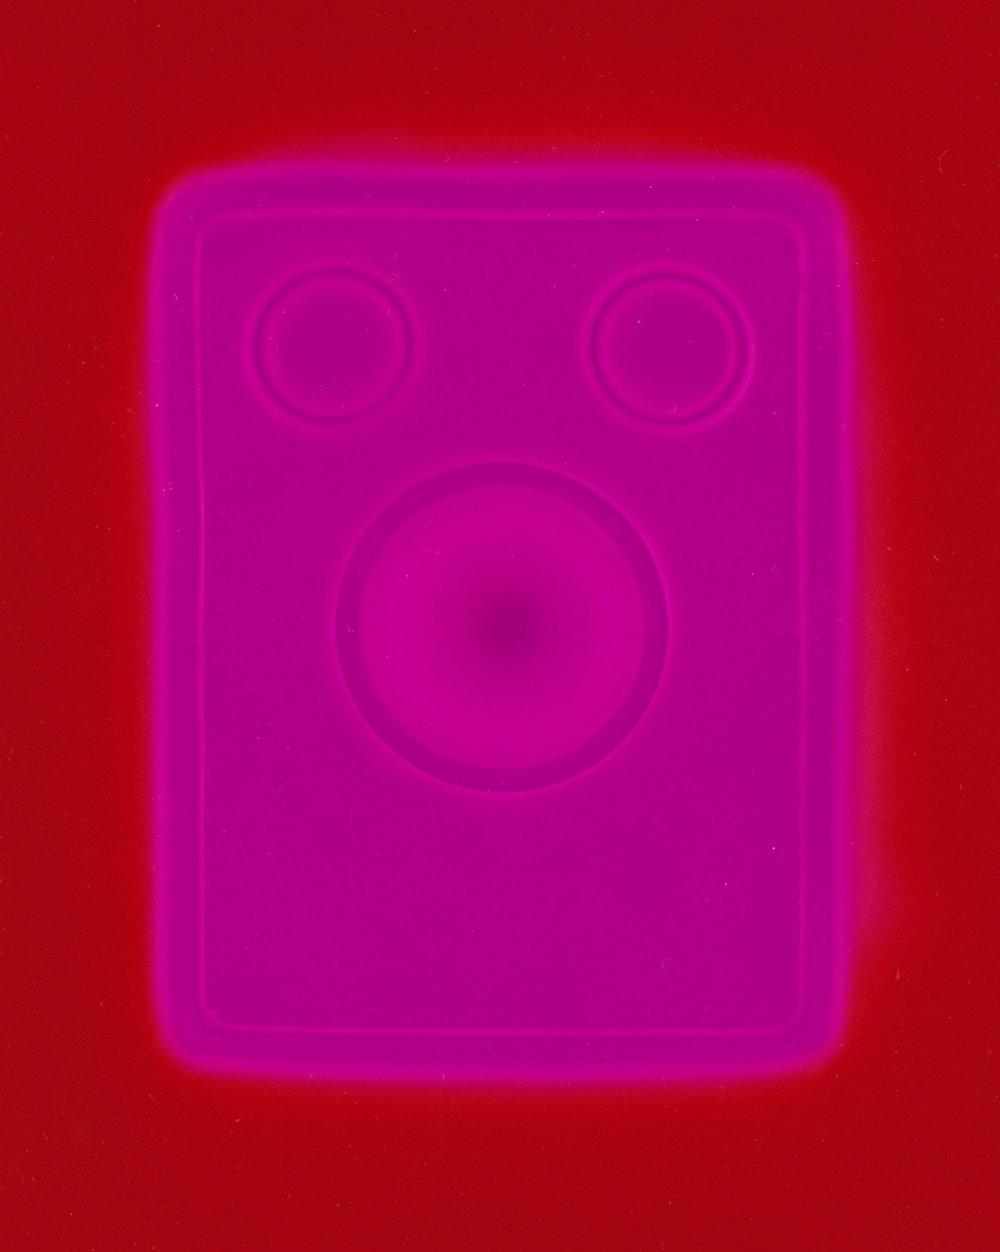 Red 3, Penelope Davis,2000, type c print, 78x100cm